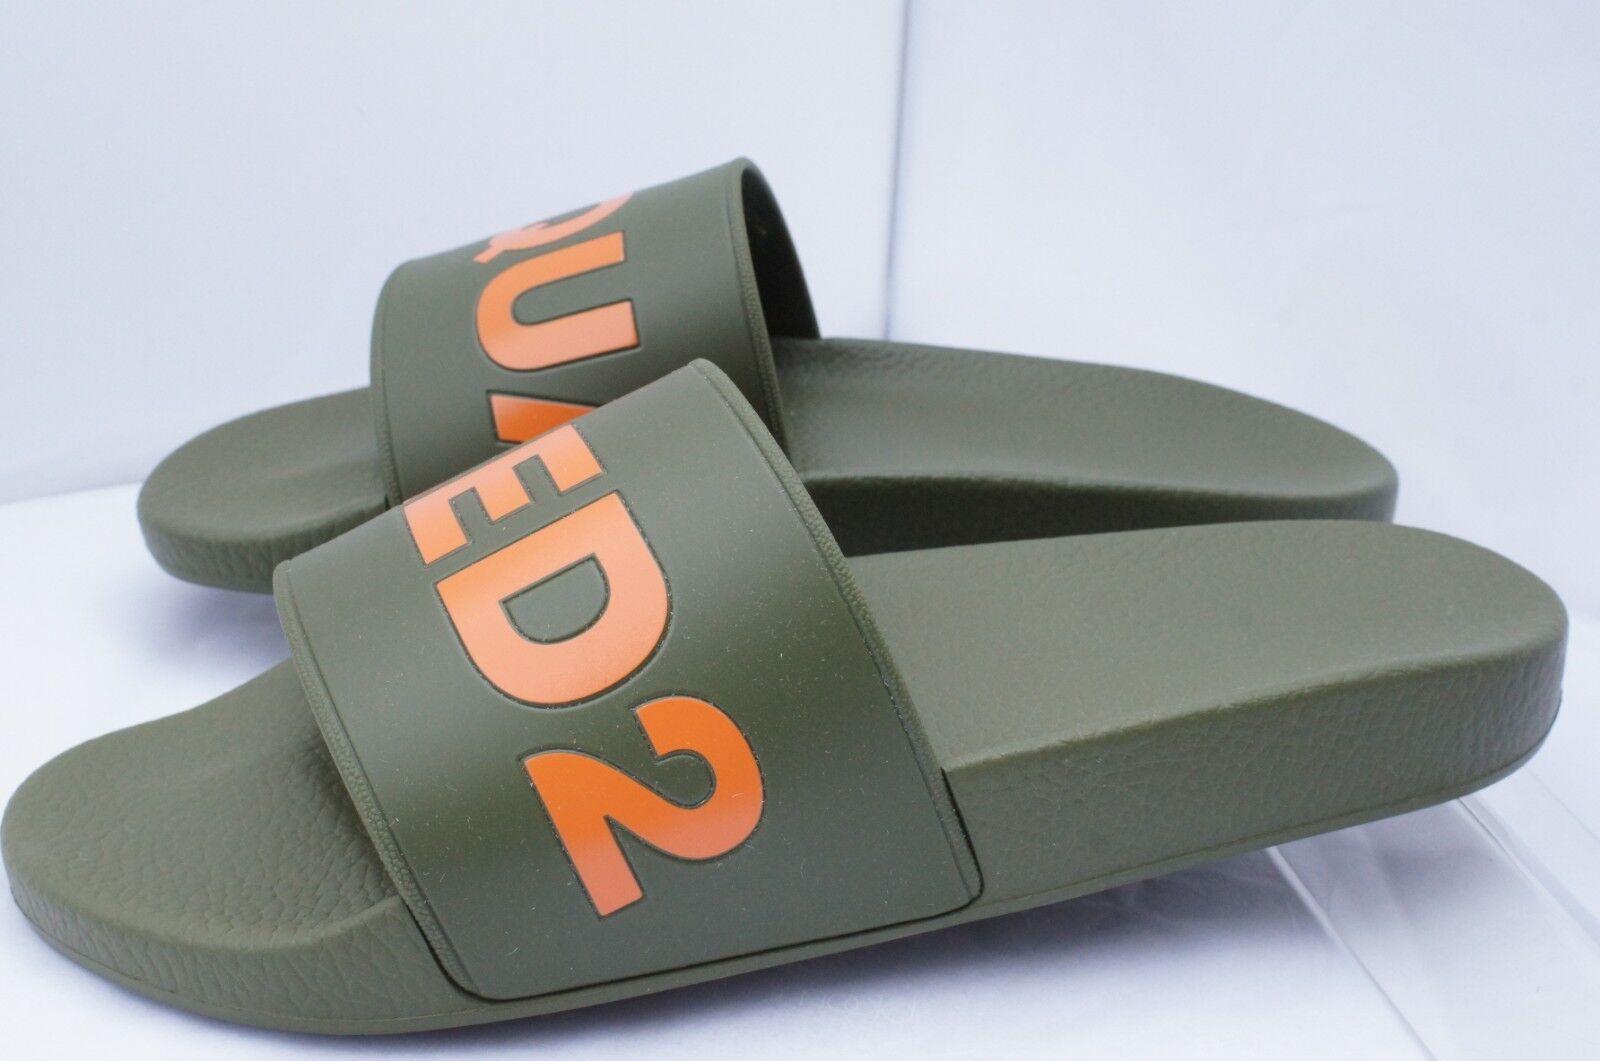 Nuevo Dsquarojo 2 para hombre Sandales verde Deslizante Duna insignia de goma Flip Flap